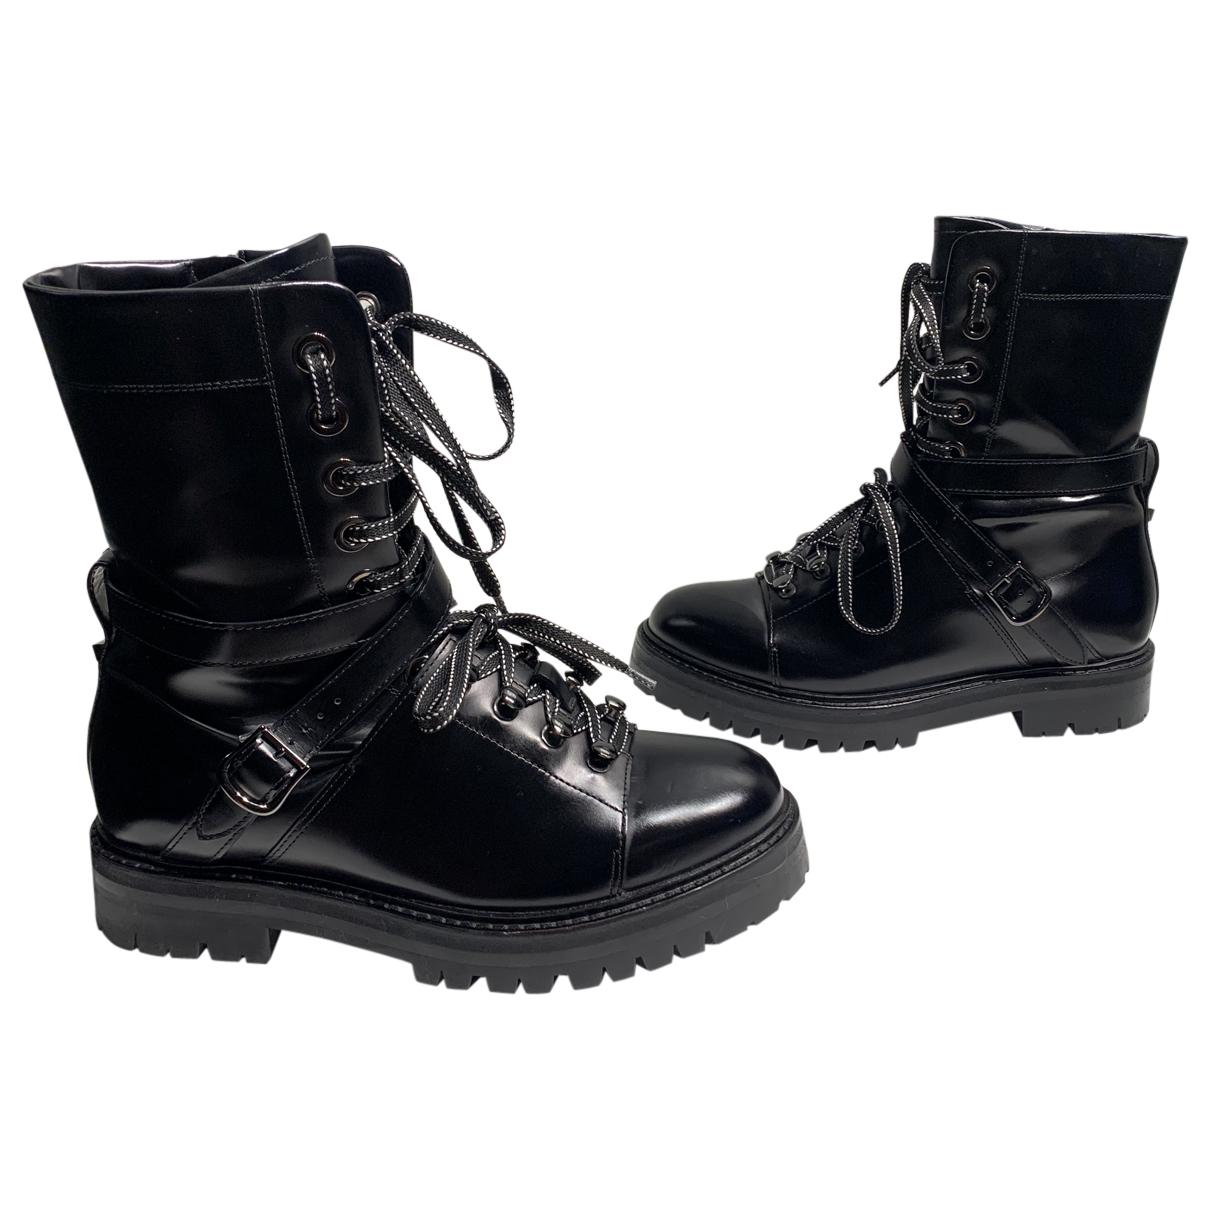 Valentino Garavani N Black Leather Boots for Women 38 EU